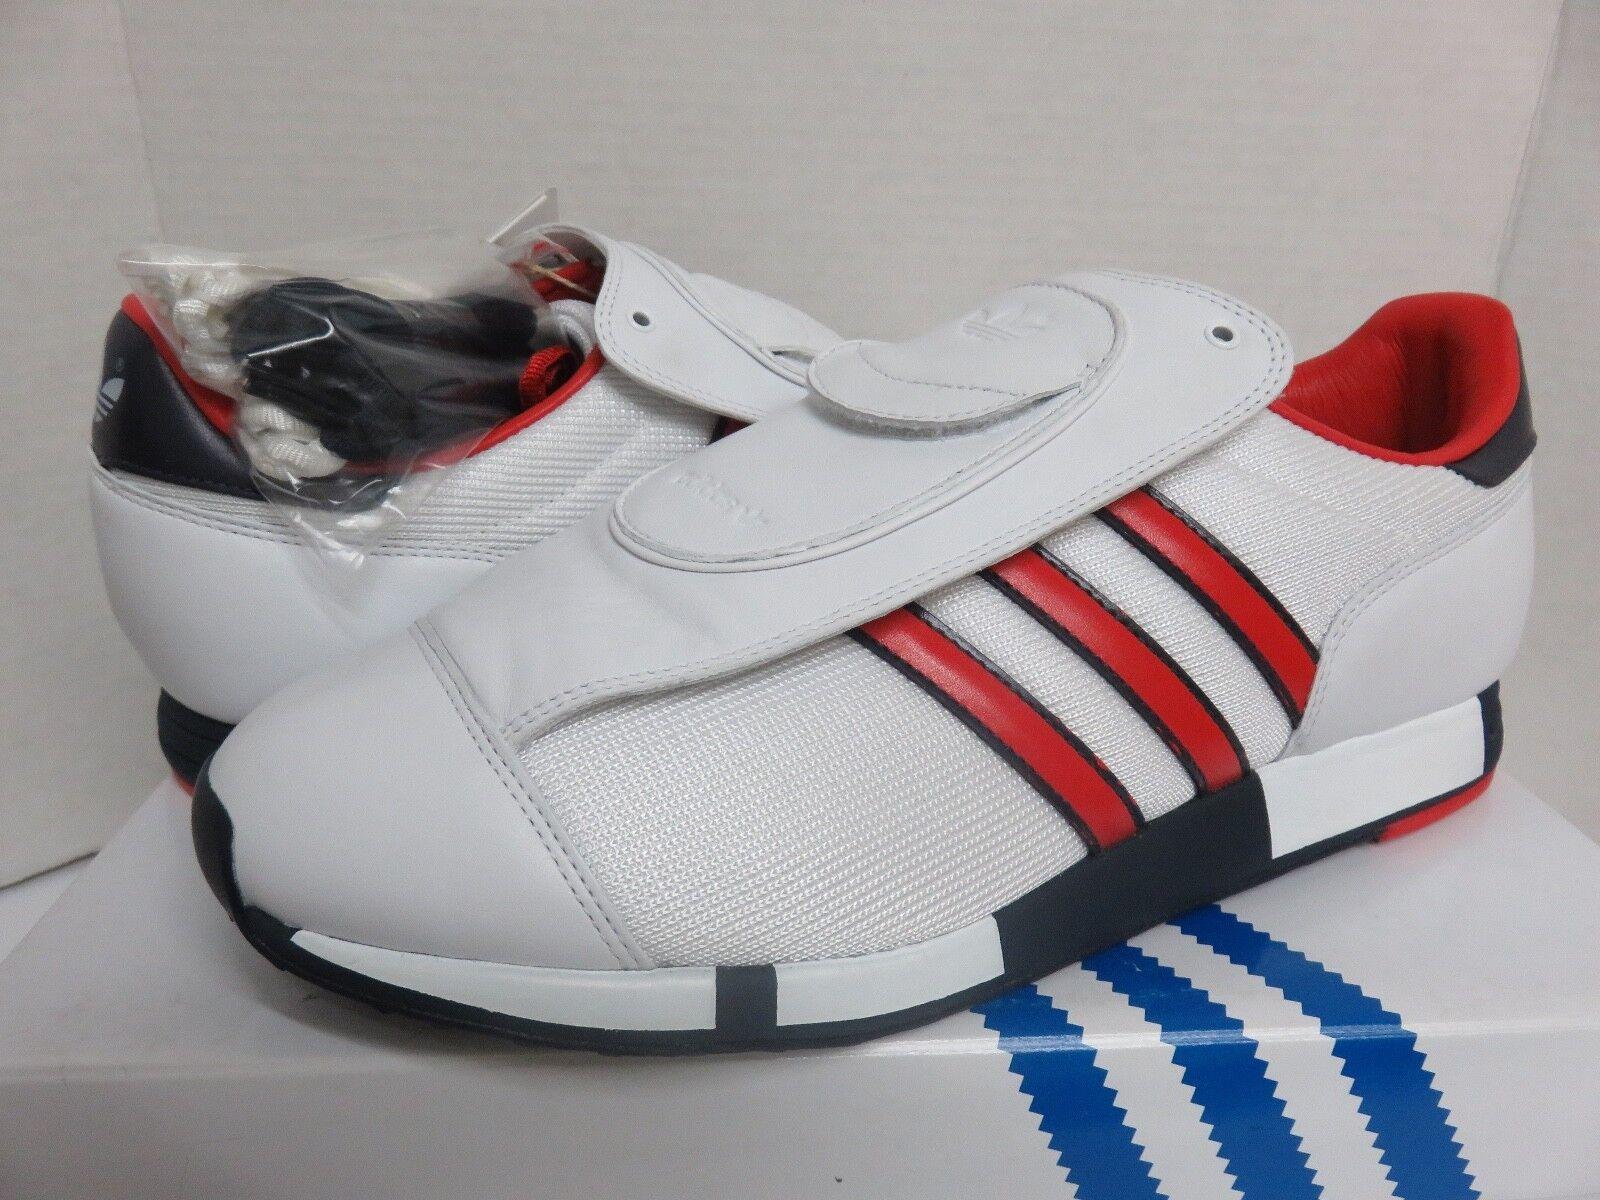 Adidas pacer db david beckham g07176 bianco / rosso uomo rari numero 10 scarpe scarpe rari uomo 9d438b